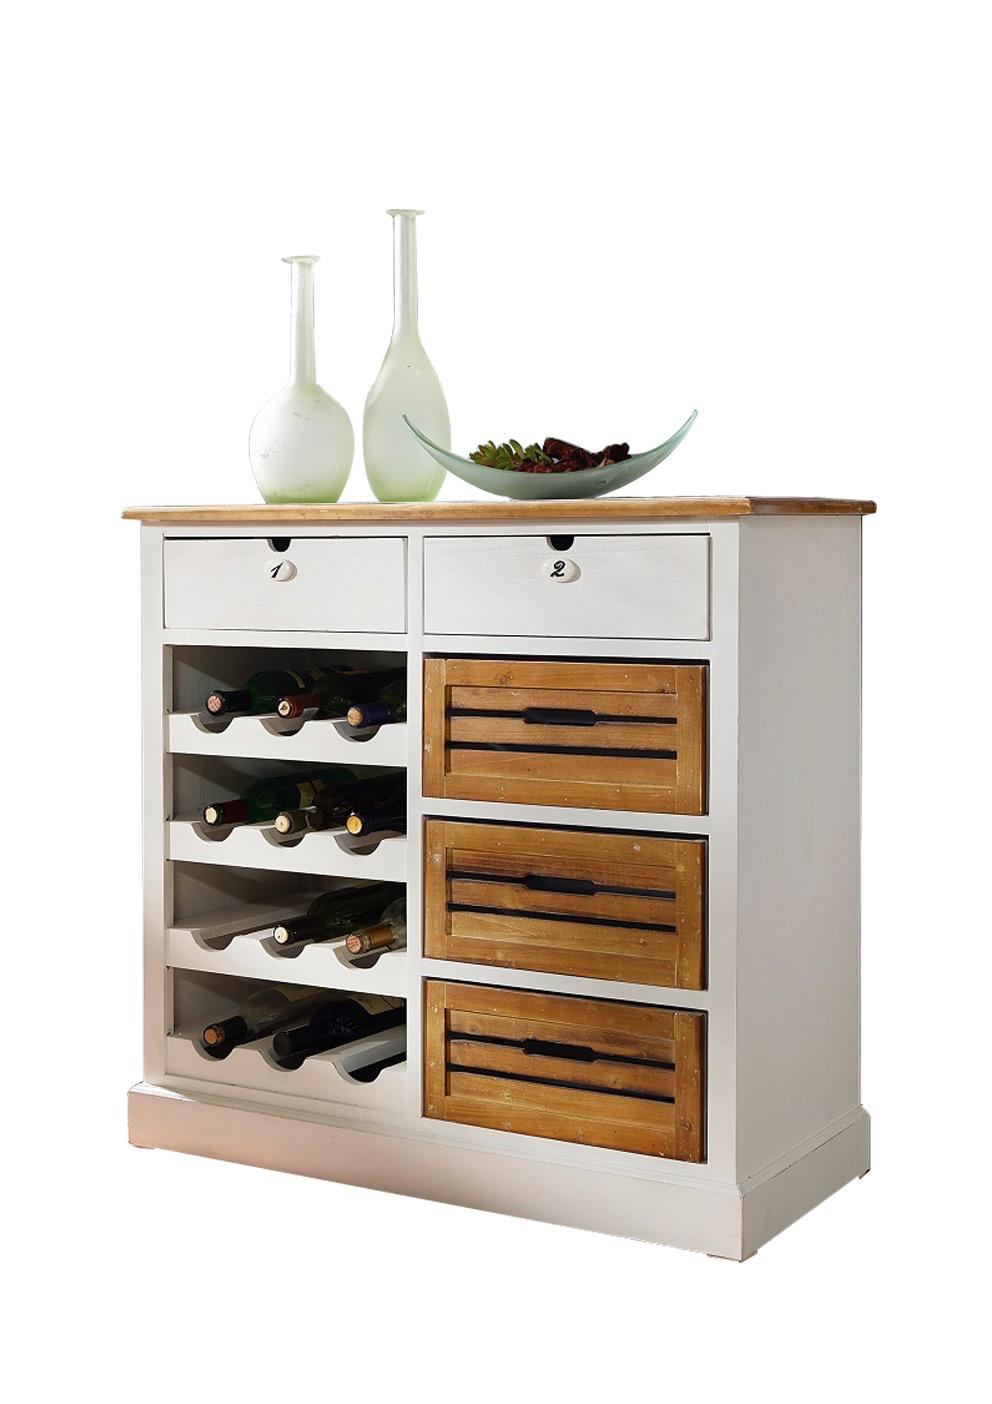 sale weinregal kommode paulowniaholz wei paris v. Black Bedroom Furniture Sets. Home Design Ideas